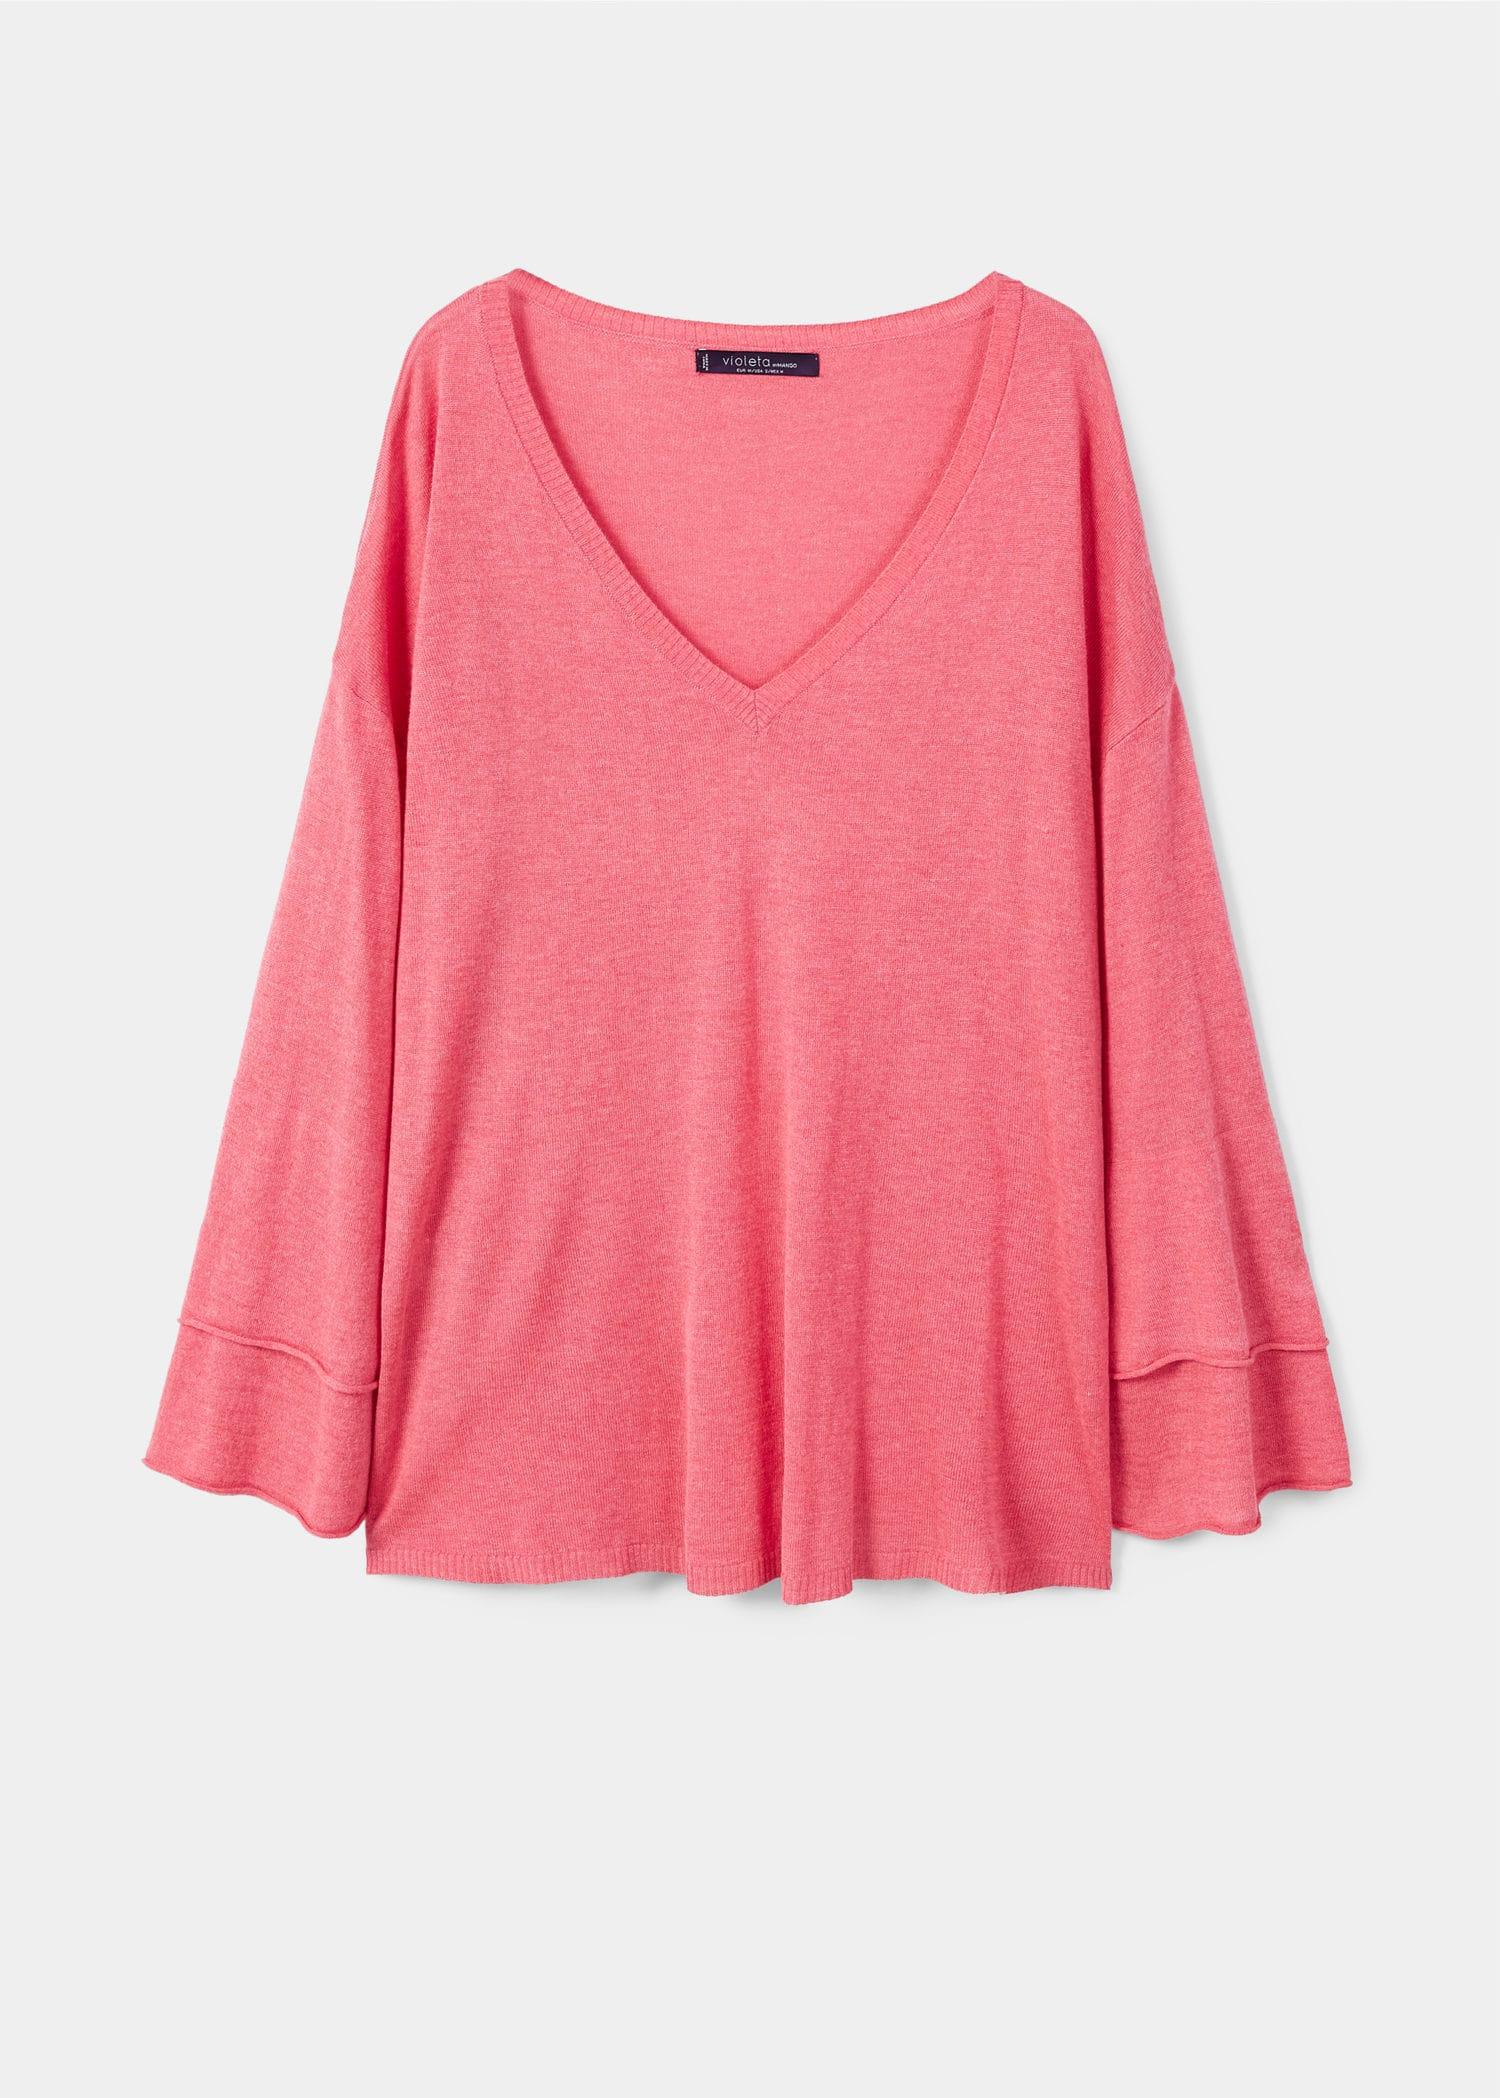 Sizes 100 Plus Cashmere By Sweater Lithuania Mango Violeta qBFOZwH